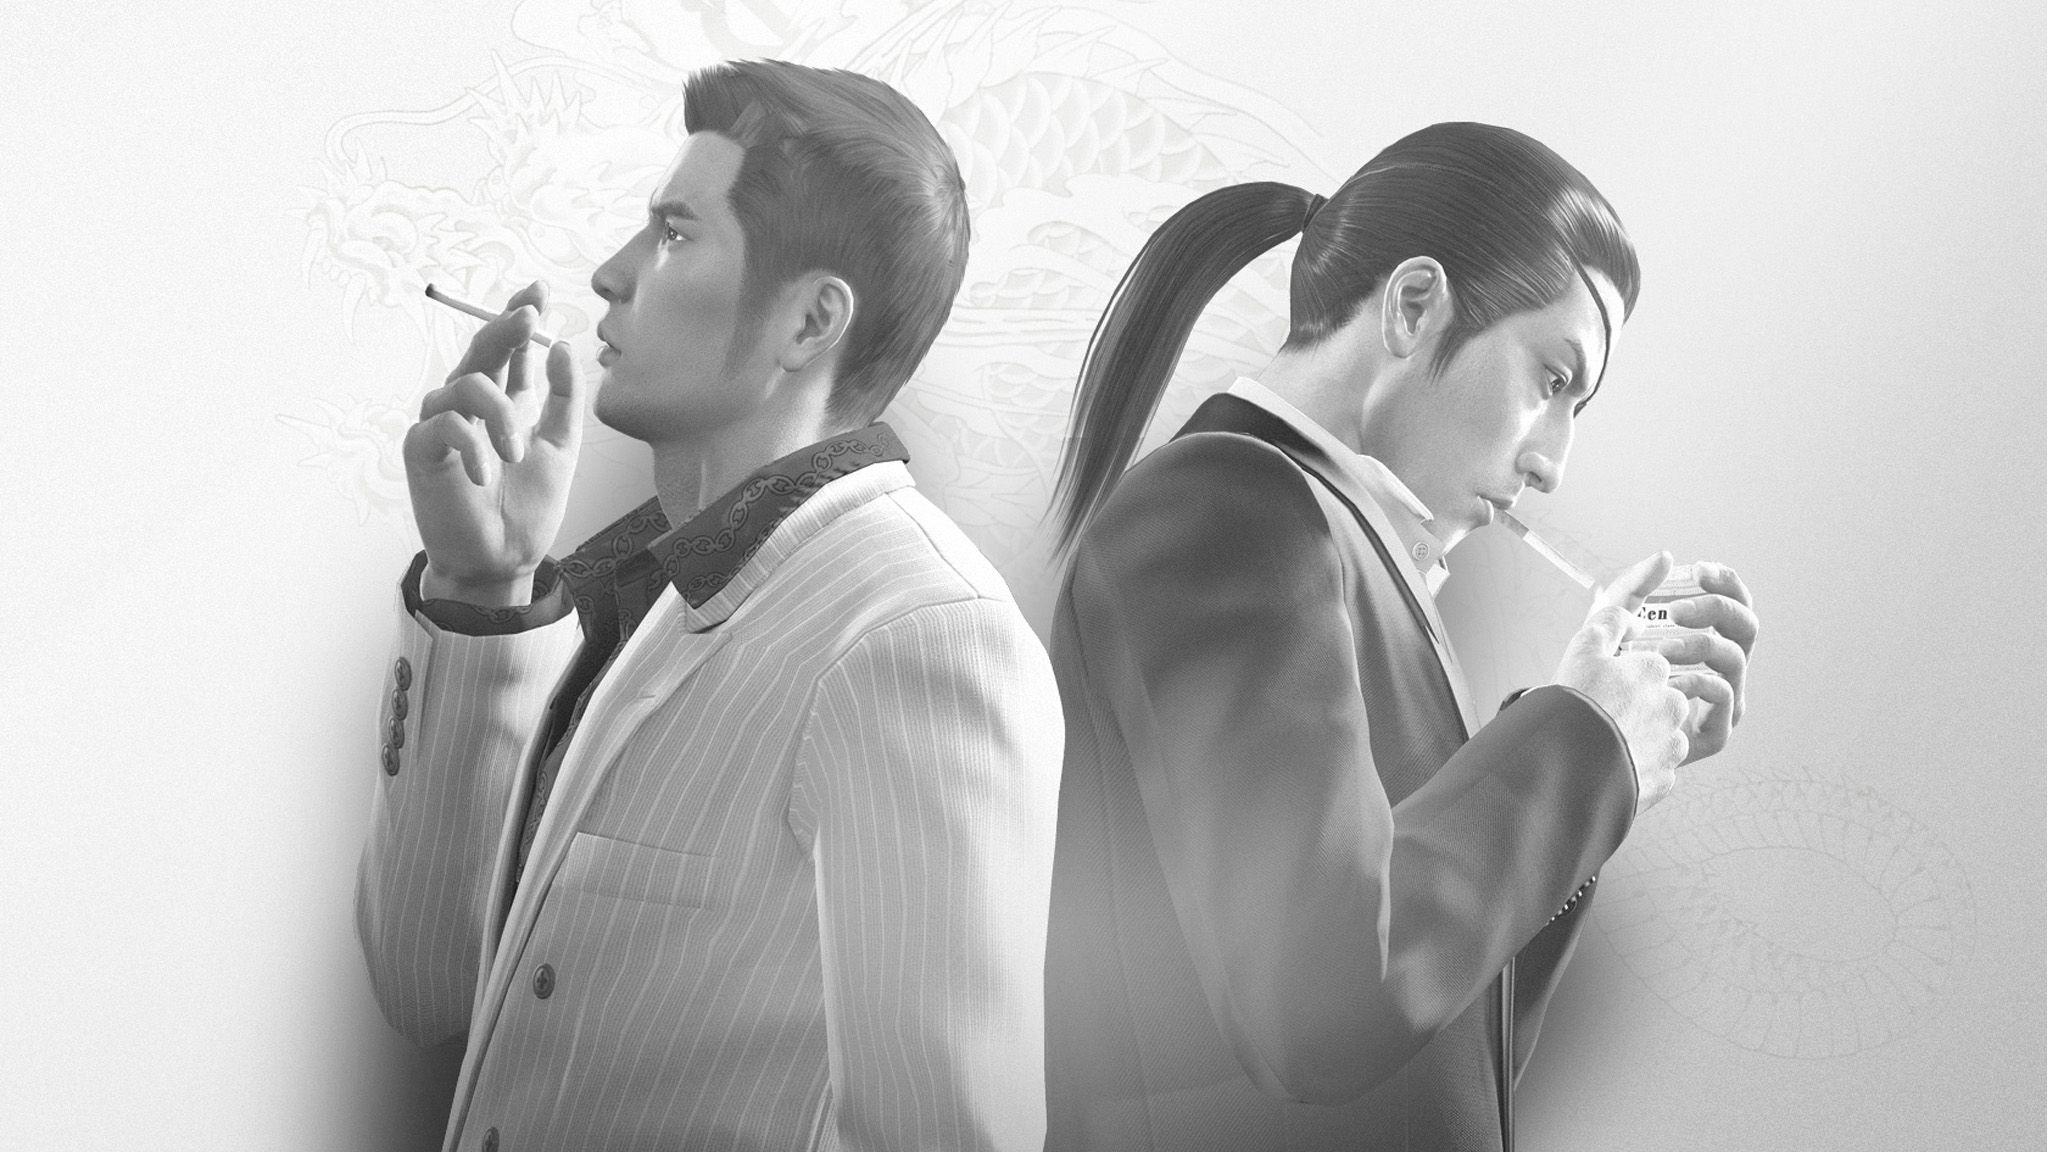 Yakuza Zero Resident Evil Vii Full Hd Pictures Kiryu